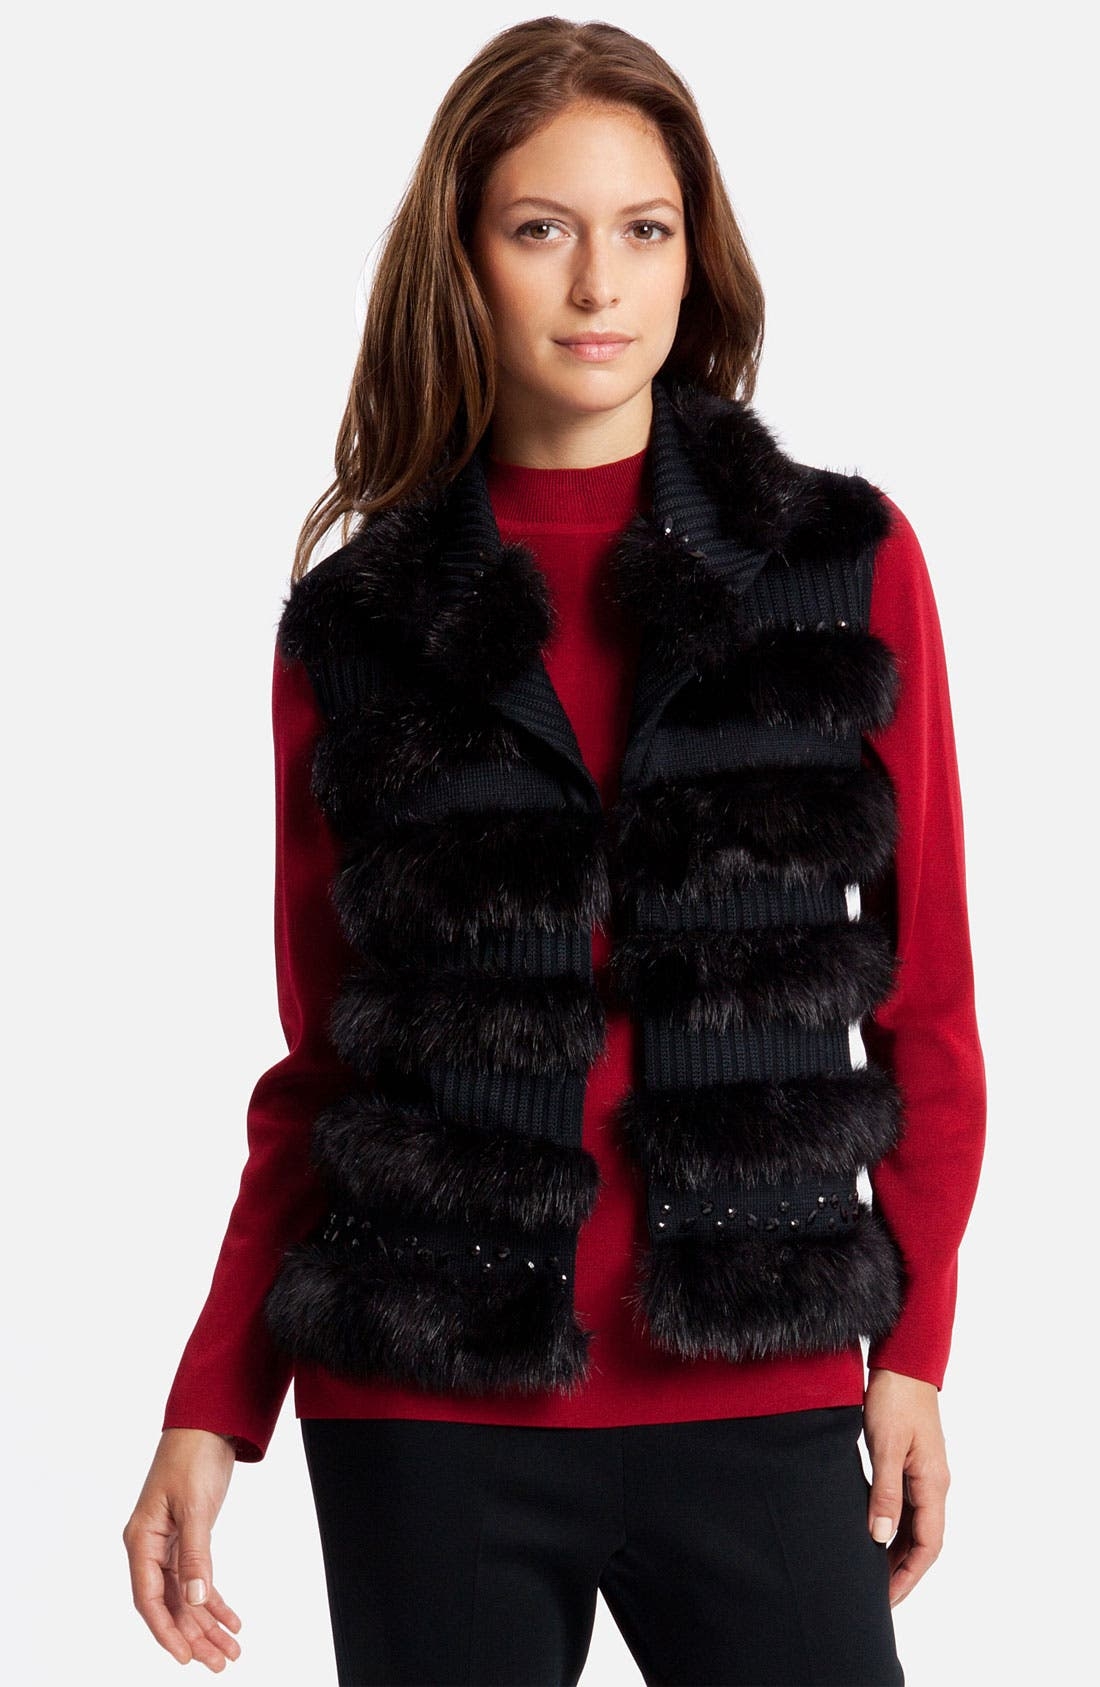 Alternate Image 1 Selected - Ming Wang Knit & Faux Fur Vest